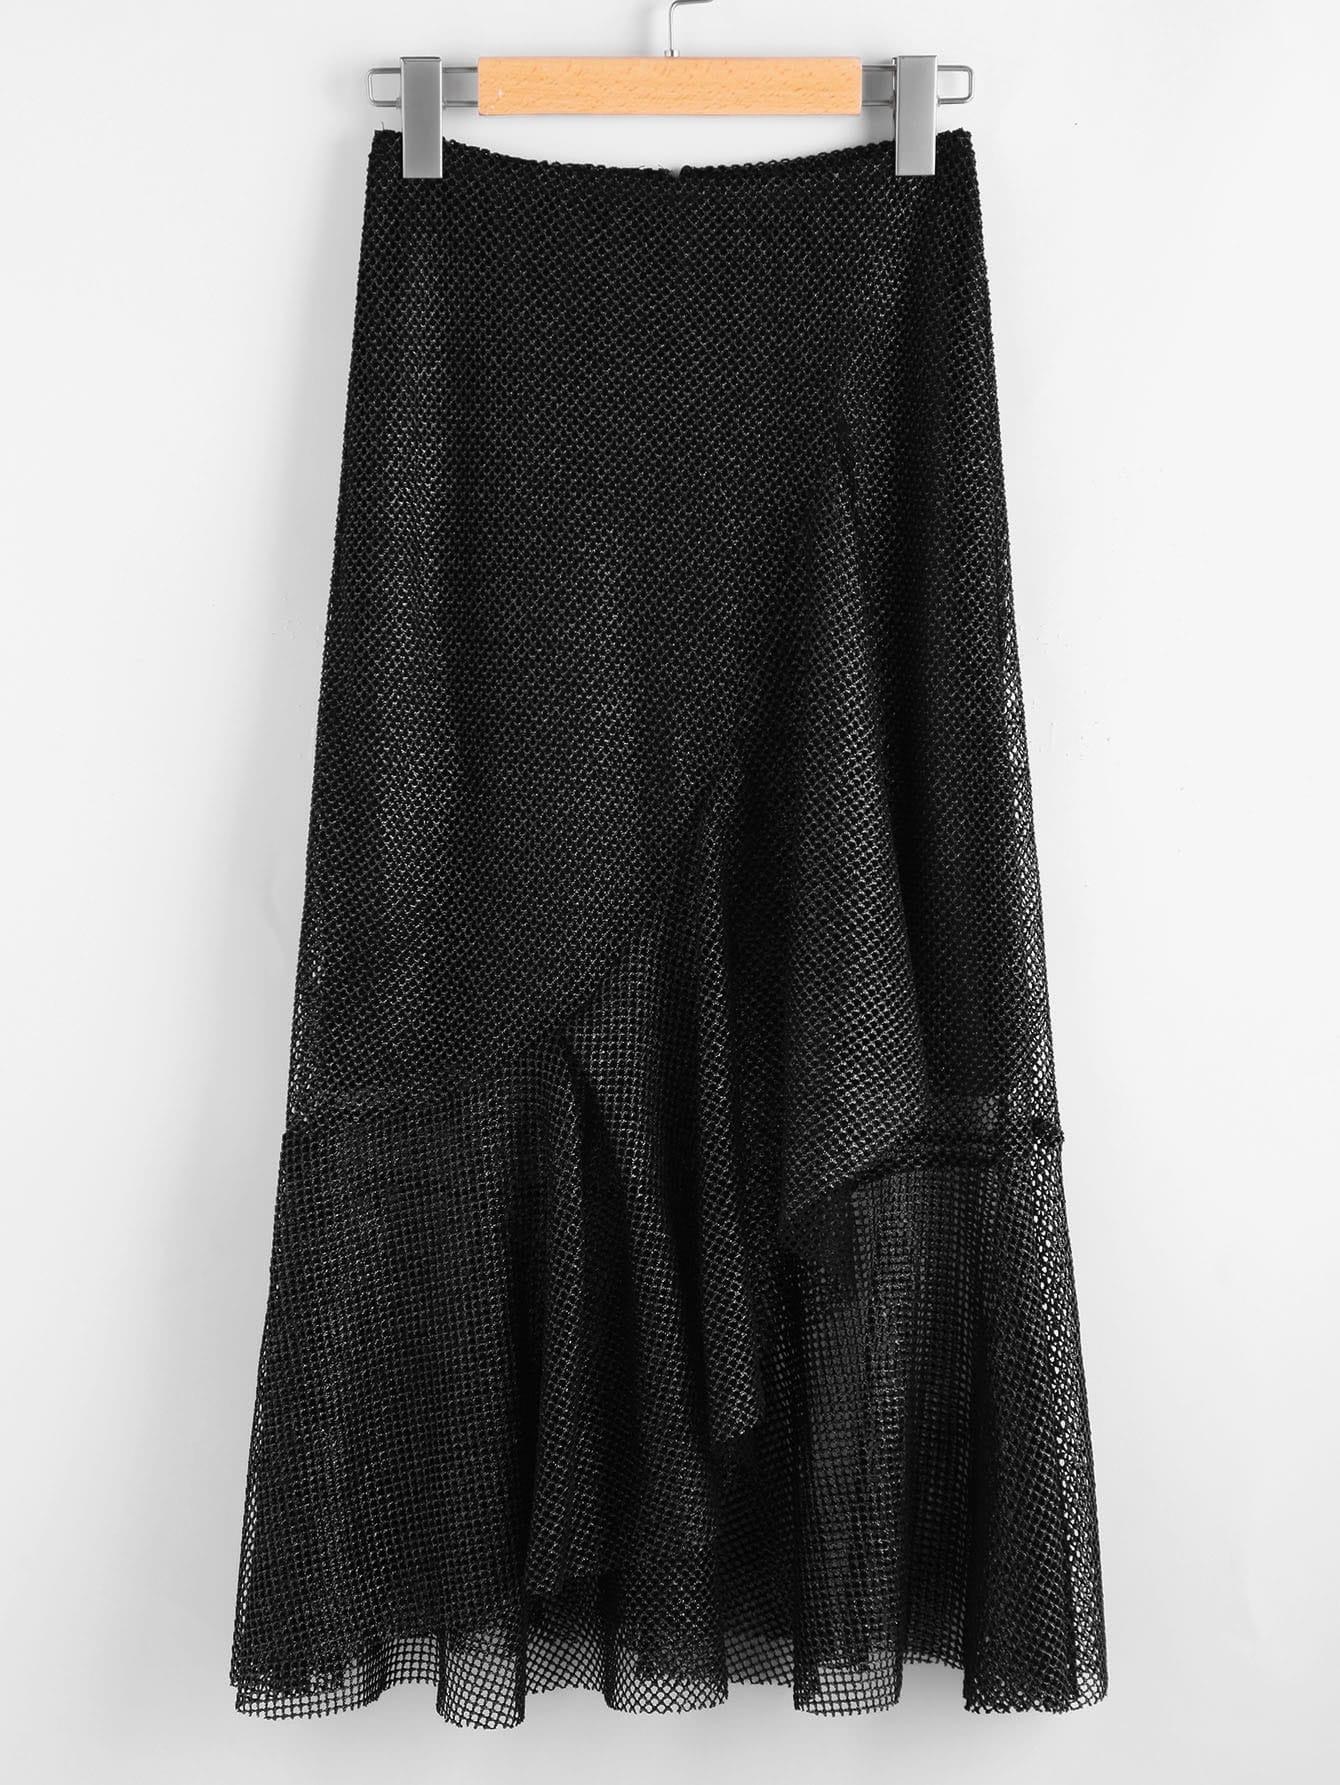 Image of Asymmetric Flounce Trim Metallic Fishnet Skirt